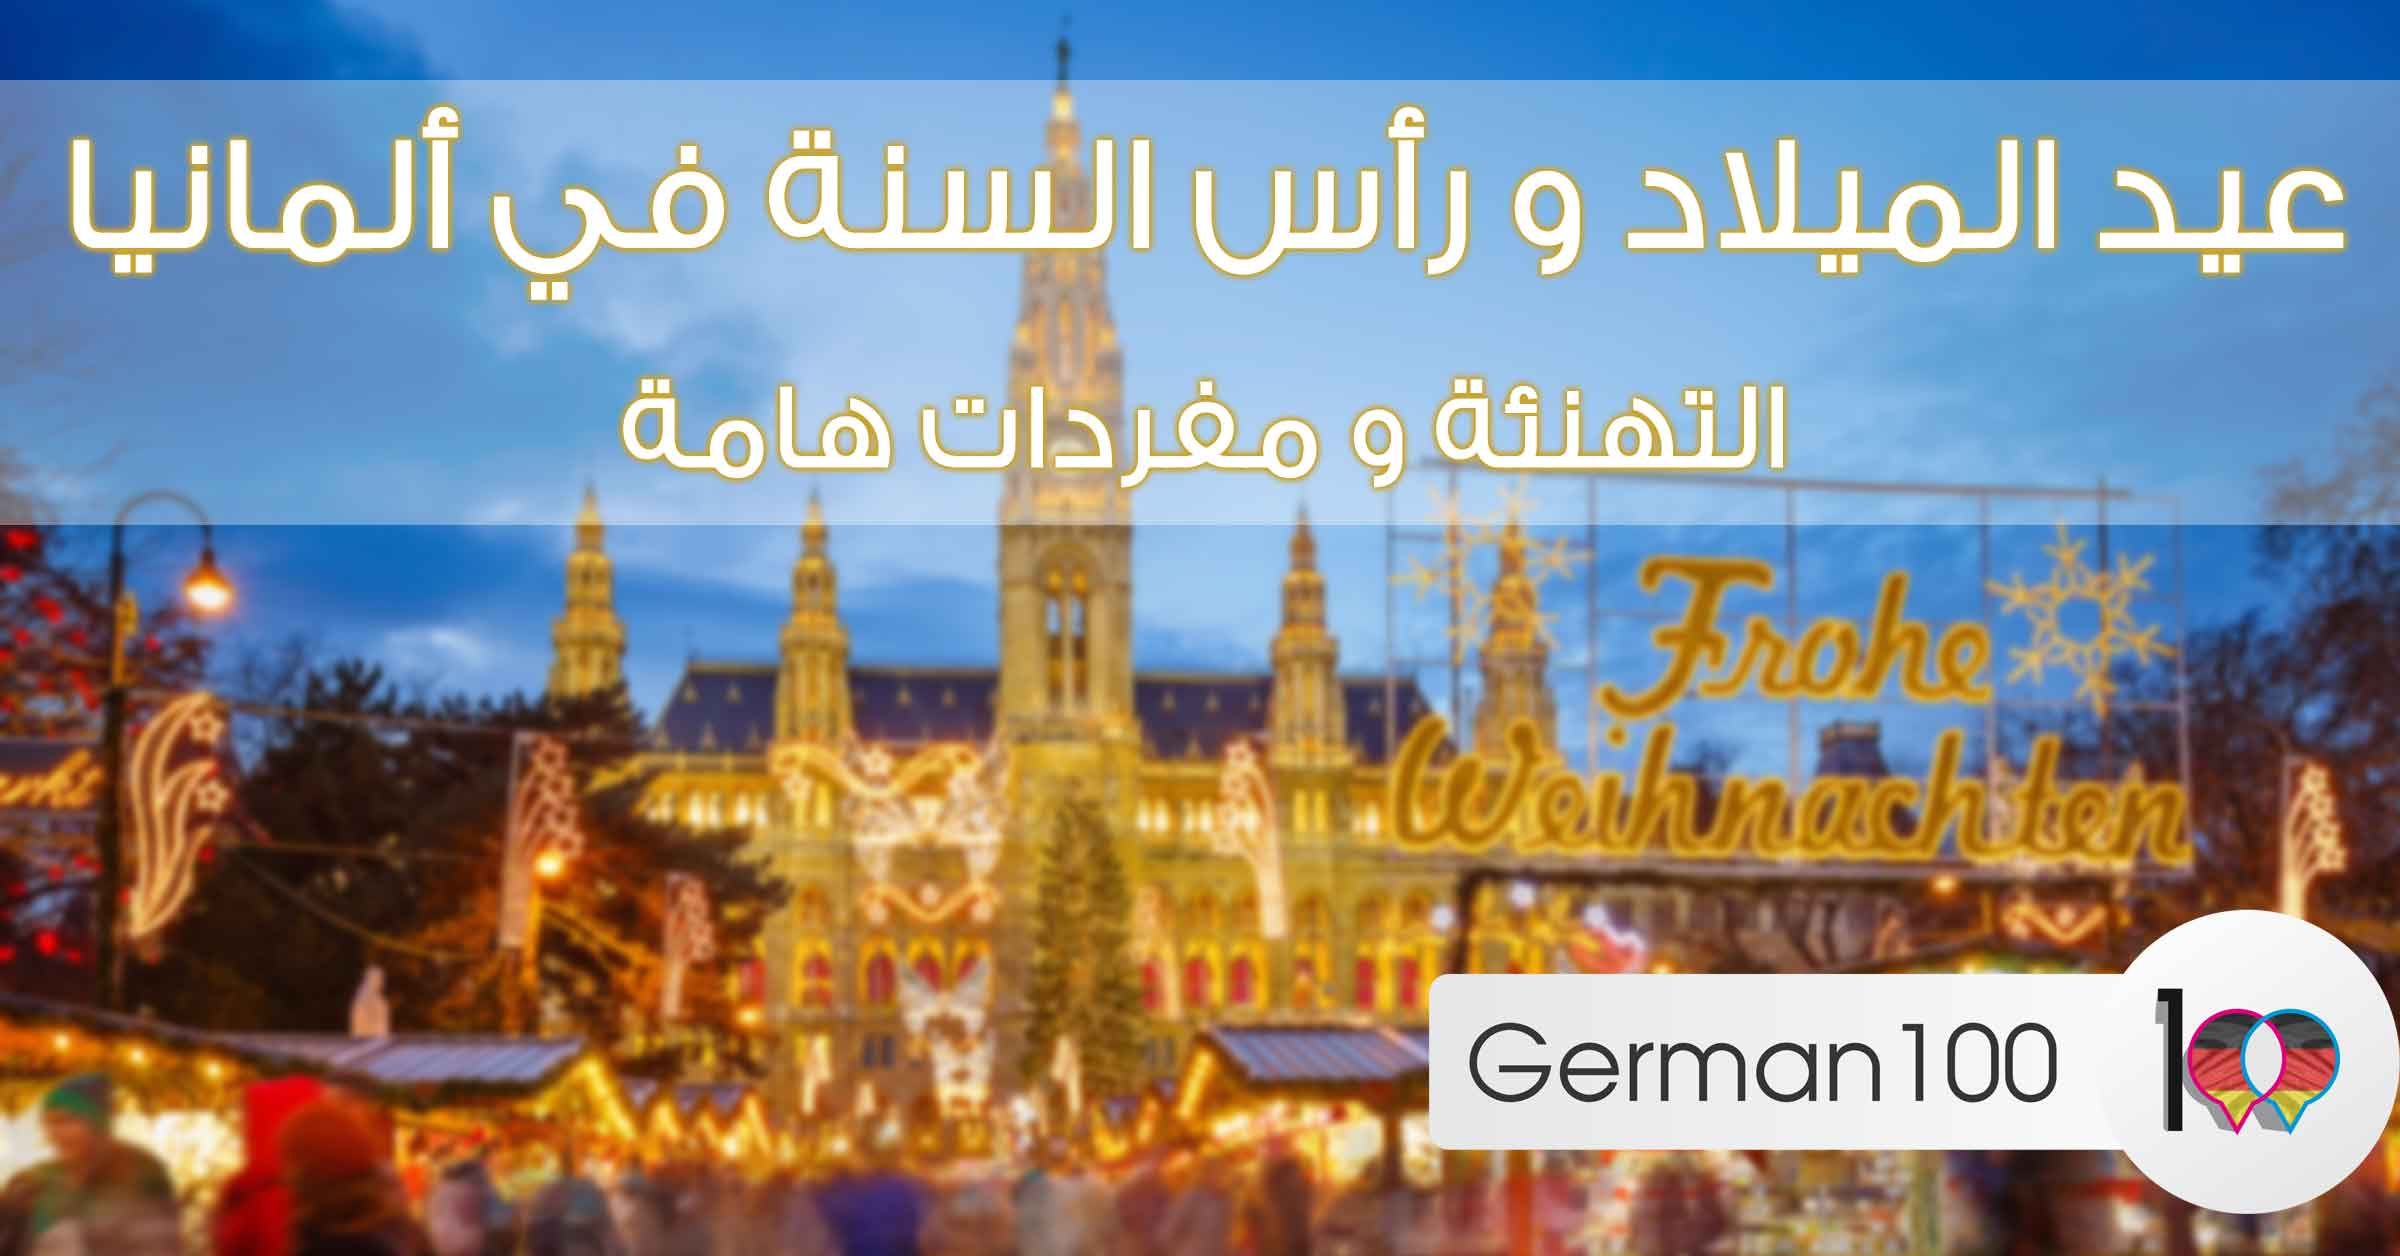 Das Weihnachten عيد الميلاد و رأس السنة Silvester في المانيا ! التهنئة و مفردات هامة